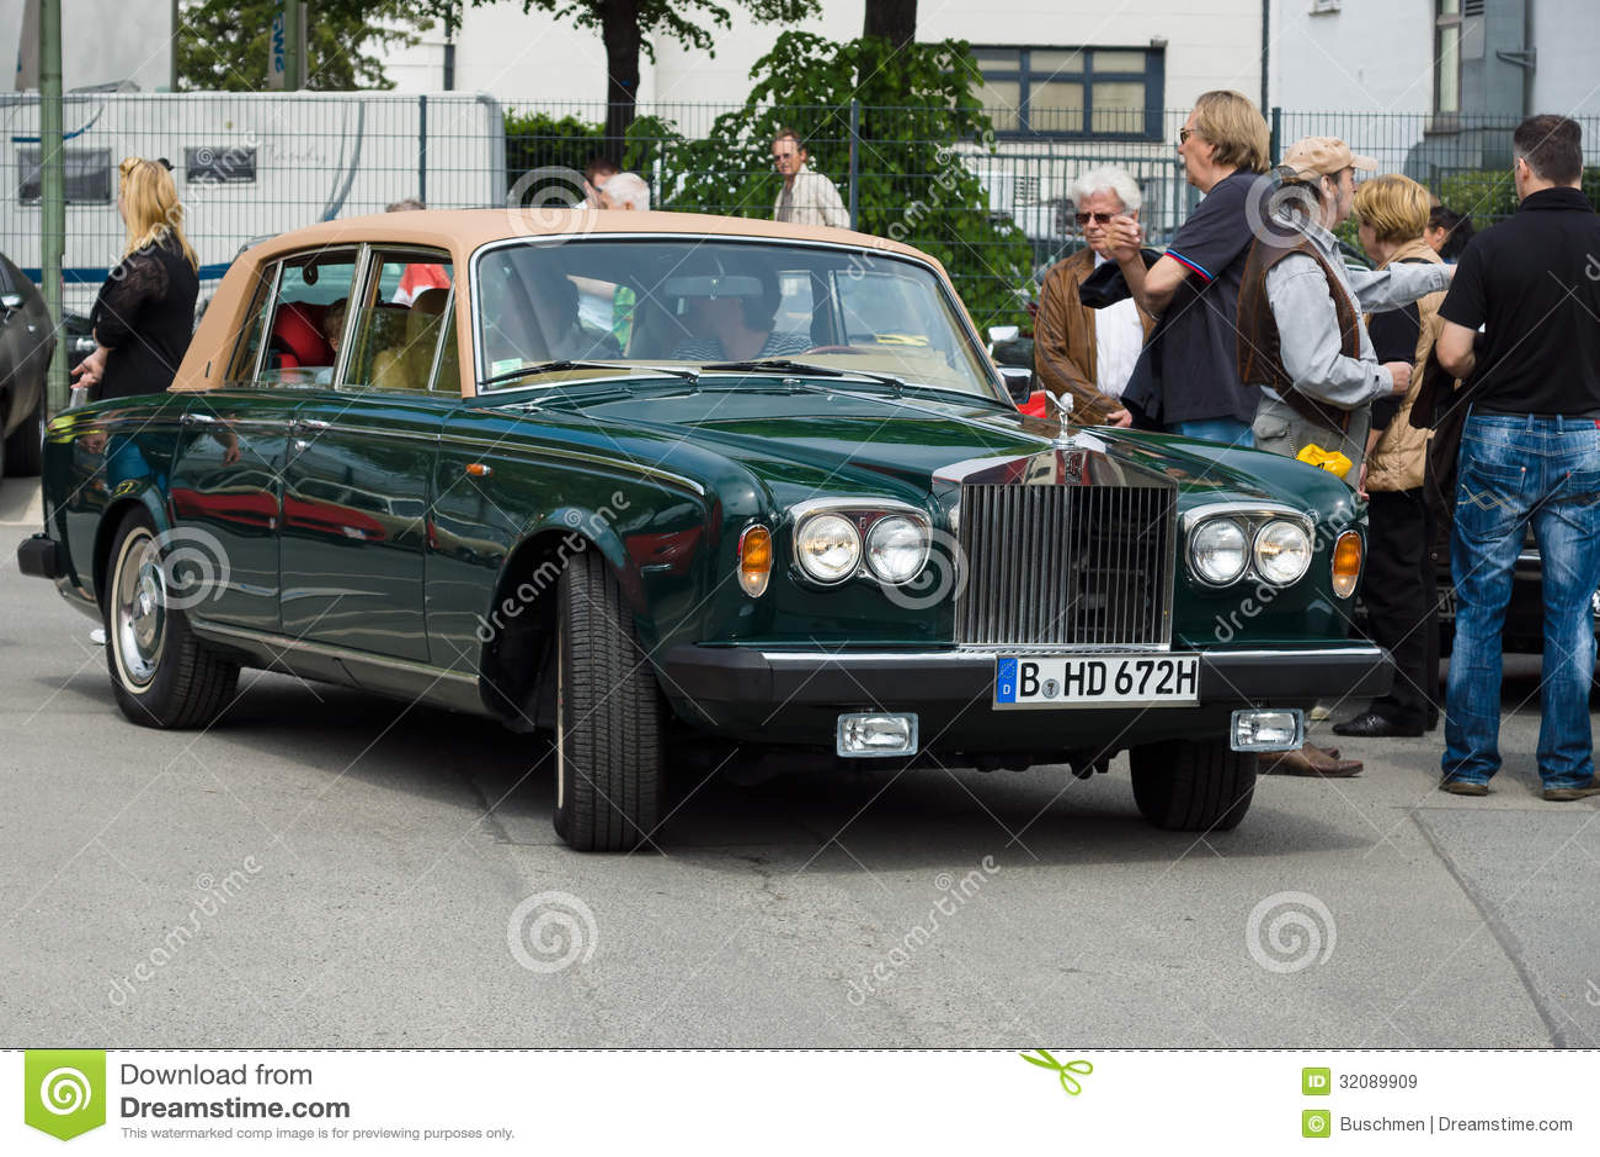 british luxury car rolls royce silver shadow ii editorial stock image image 32089909. Black Bedroom Furniture Sets. Home Design Ideas